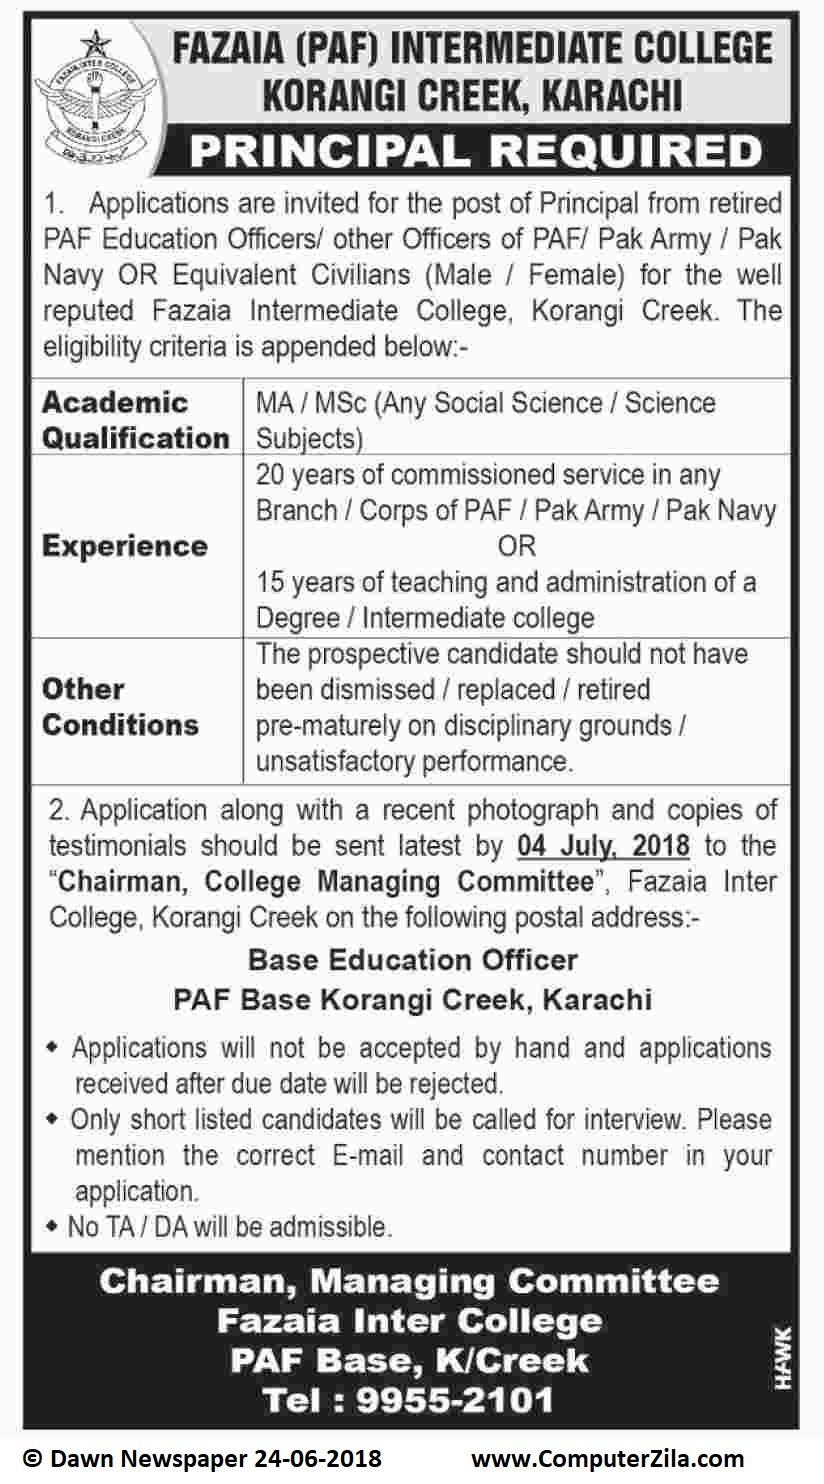 Principal Required at Fazaia (PAF) Intermediate College Korangi Creek